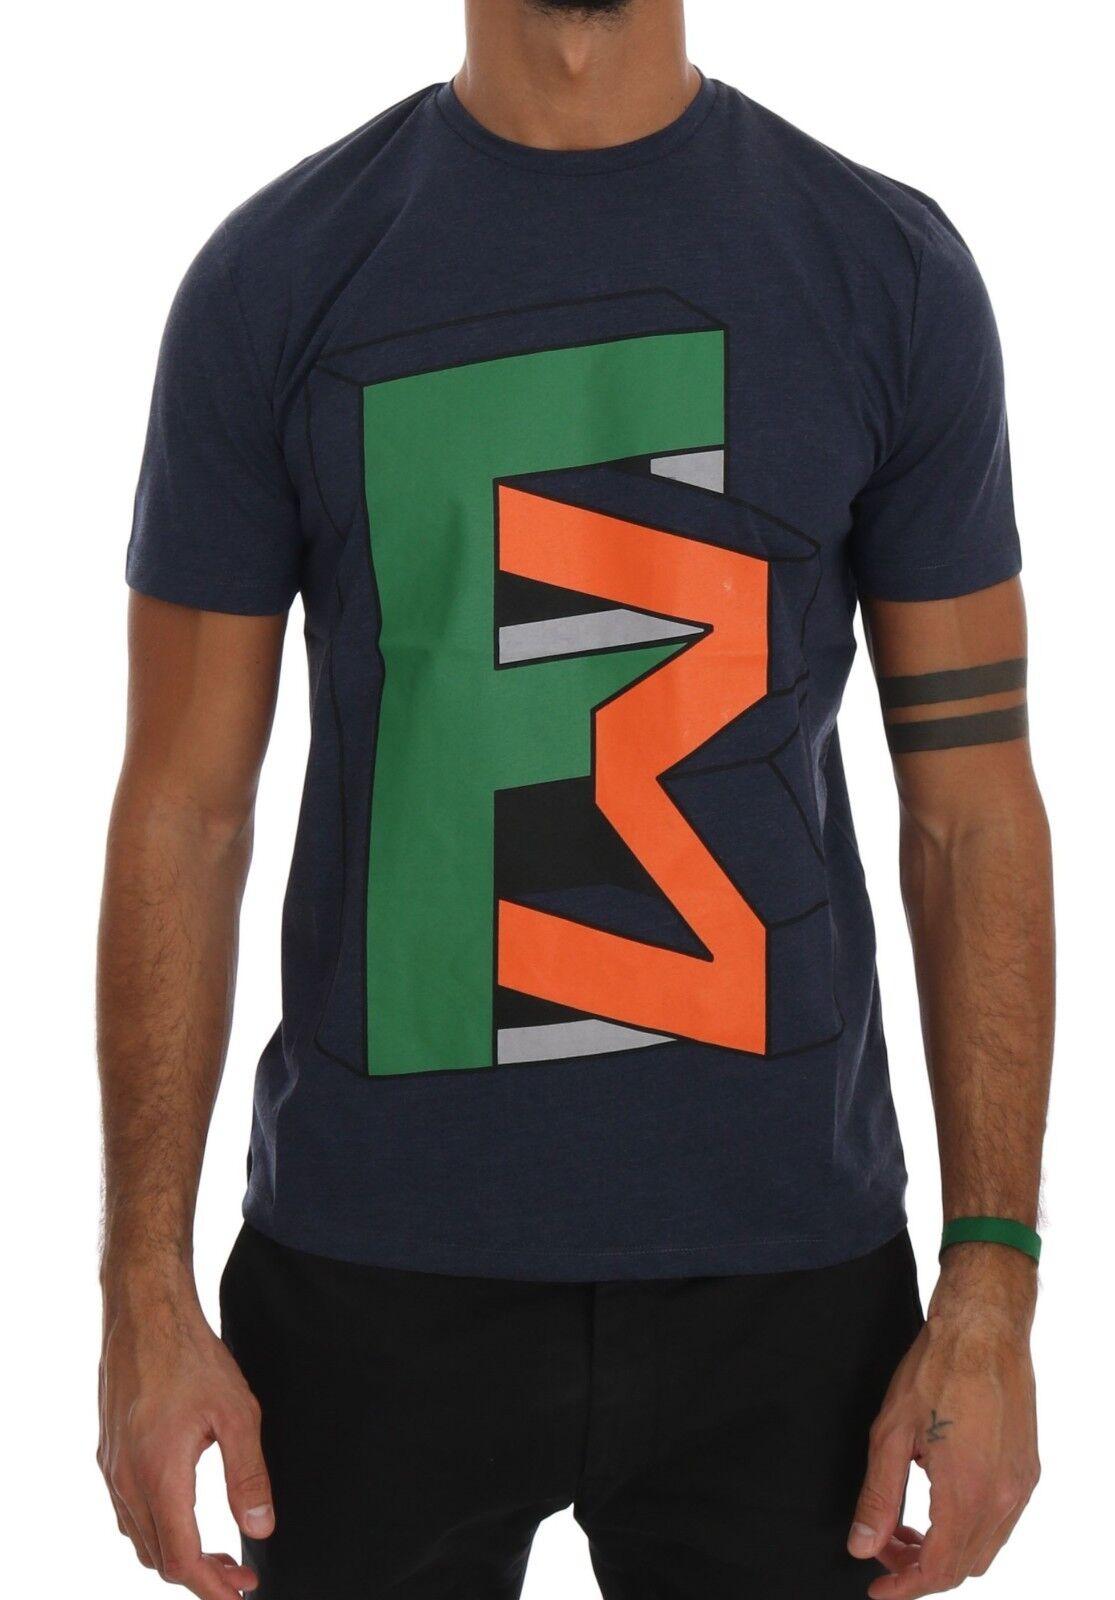 NEW 110 FRANKIE MORELLO T-shirt Blau Cotton Branded Short Sleeve  Herren Top s XXL